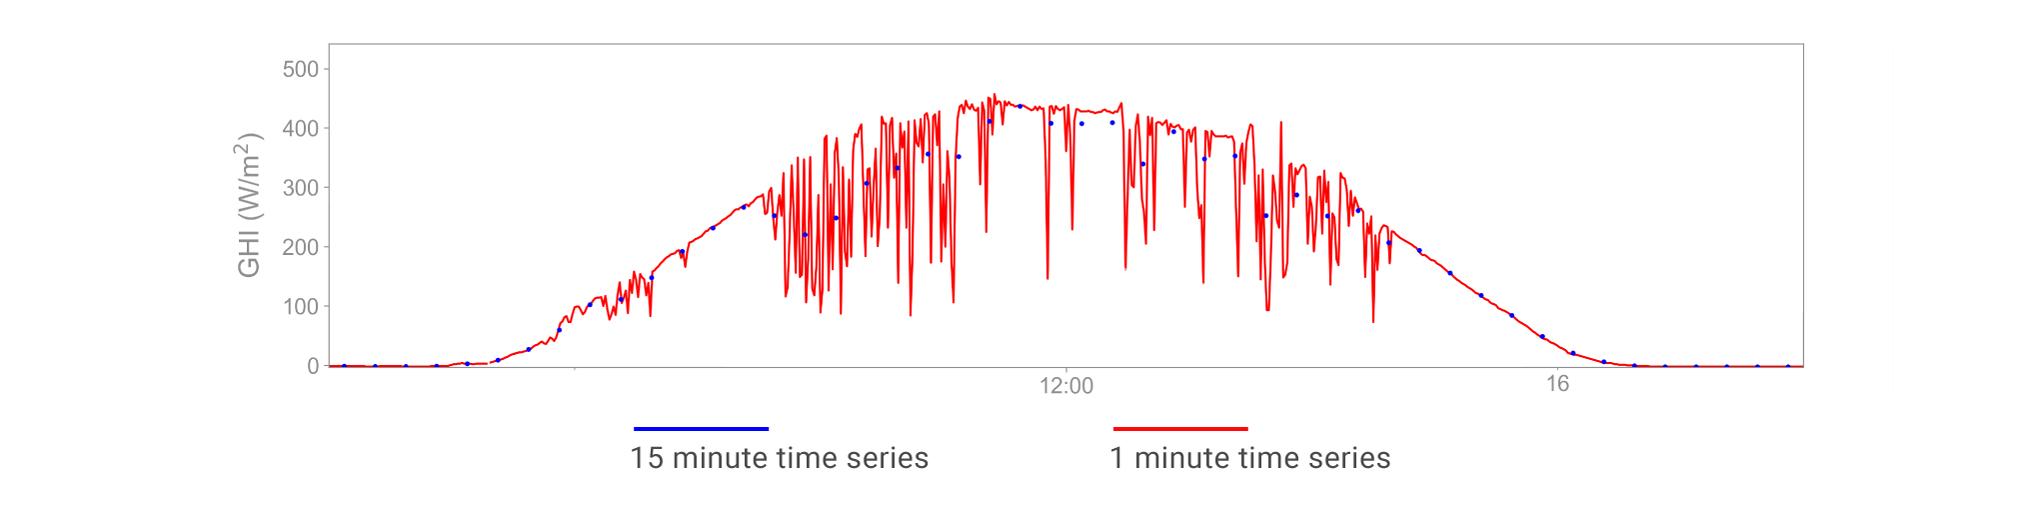 1 minute ts